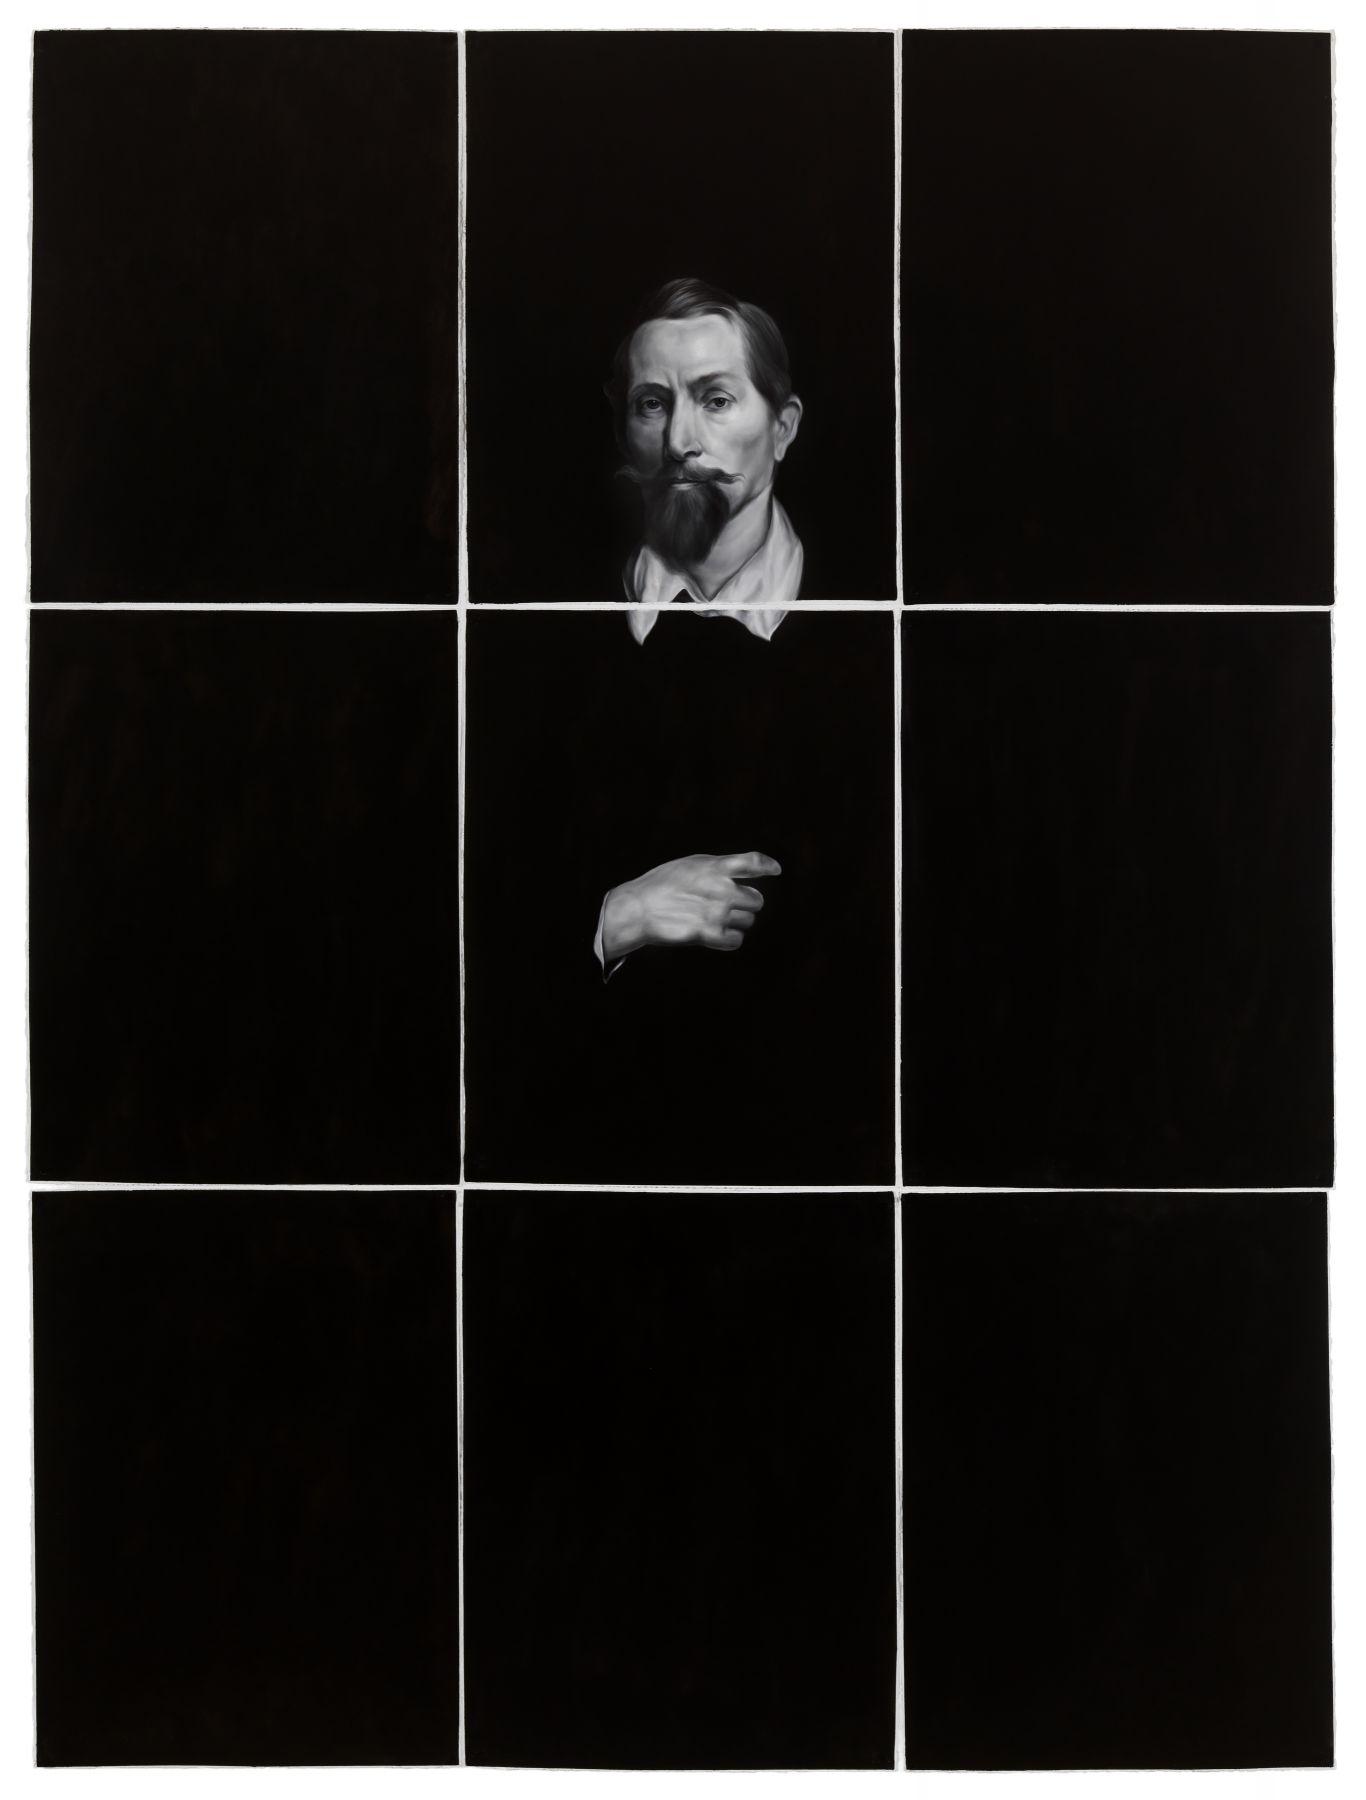 Shelley Reed, Man (after van Dyck), 2017